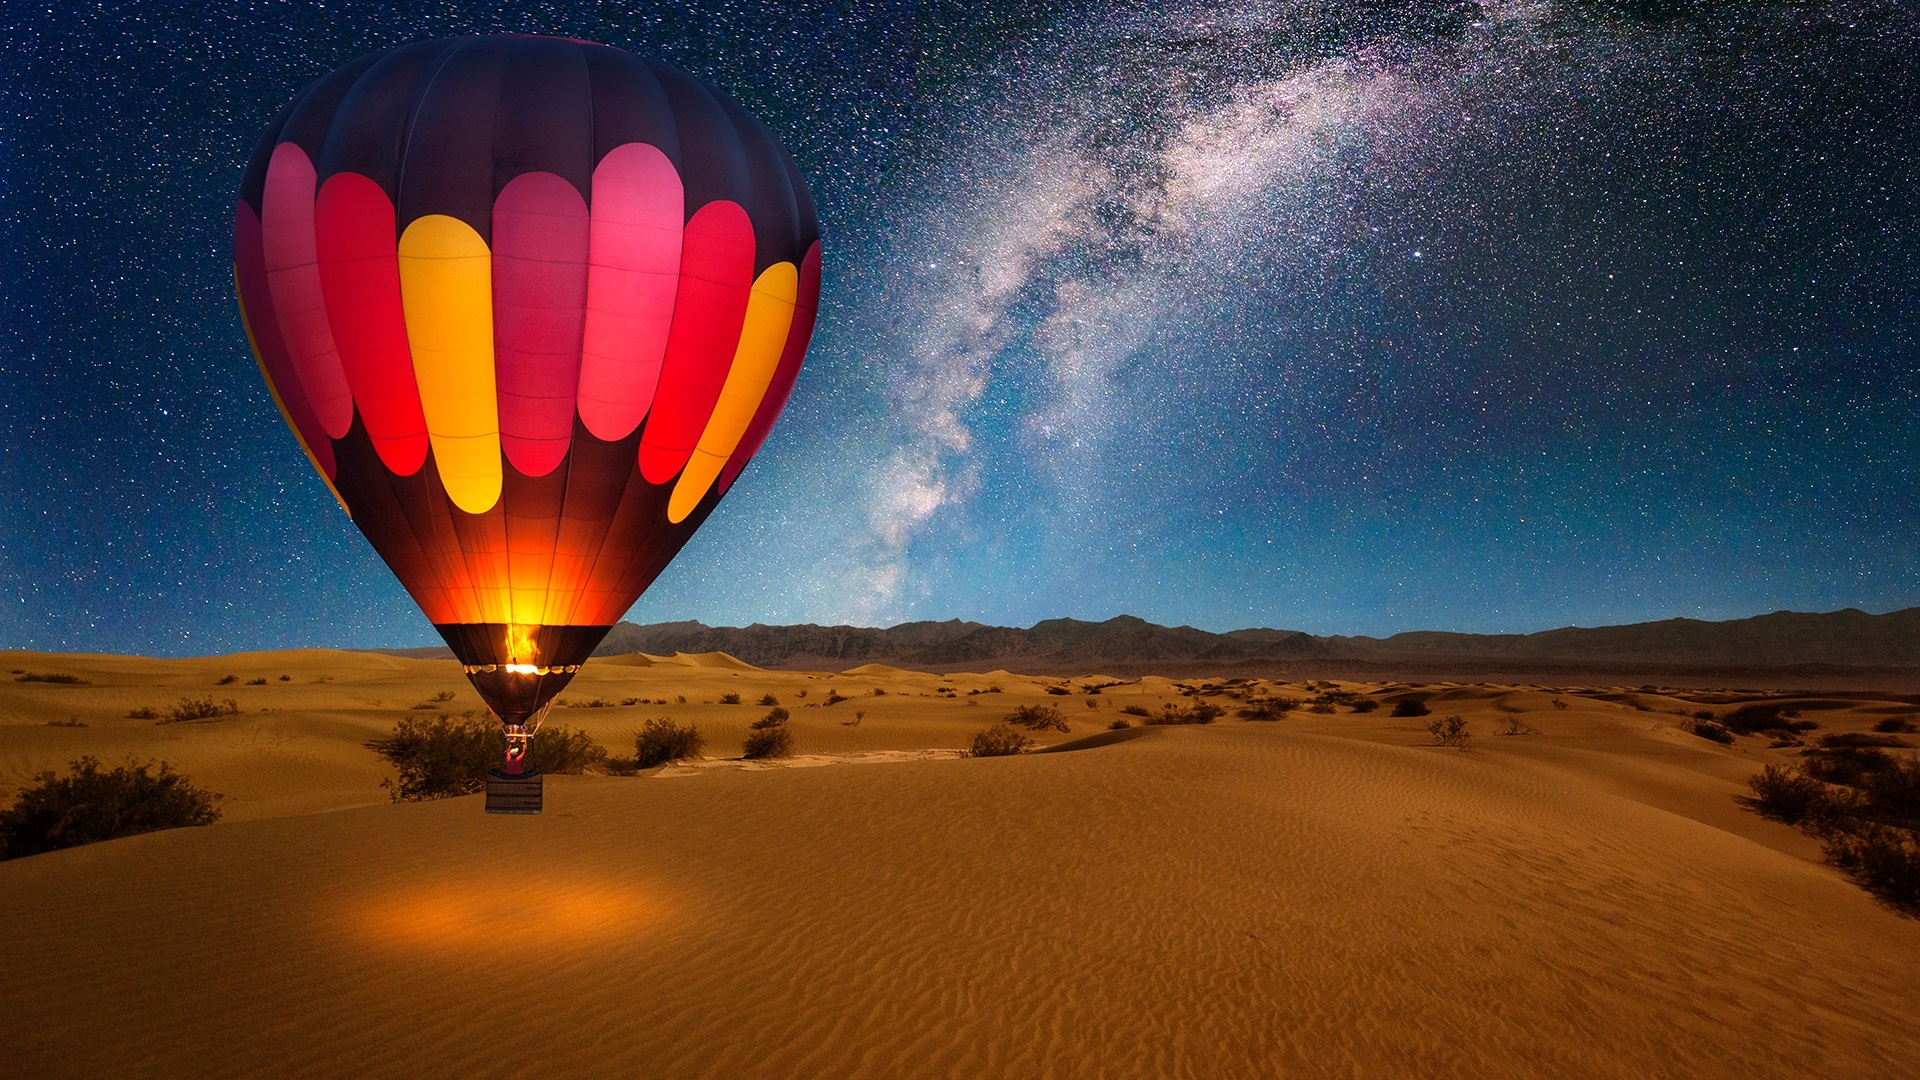 1920x1080 hot air balloon on desert night laptop full hd 1080p hd 4k wallpapers images - Air wallpaper hd ...